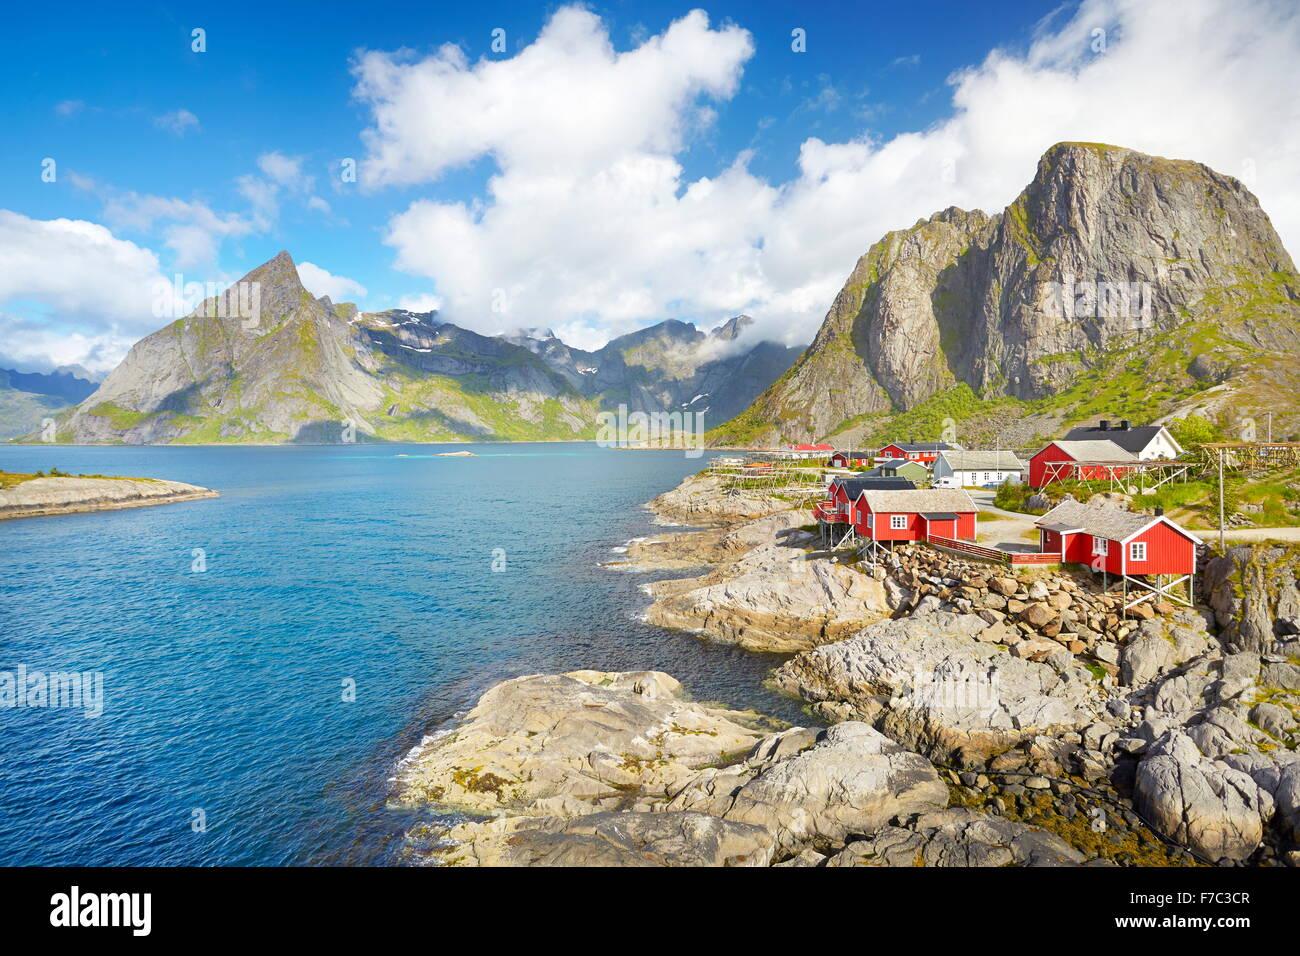 Traditionellen roten Holz Fischer Hütten Rorbu, Lofoten Insellandschaft, Norwegen Stockbild